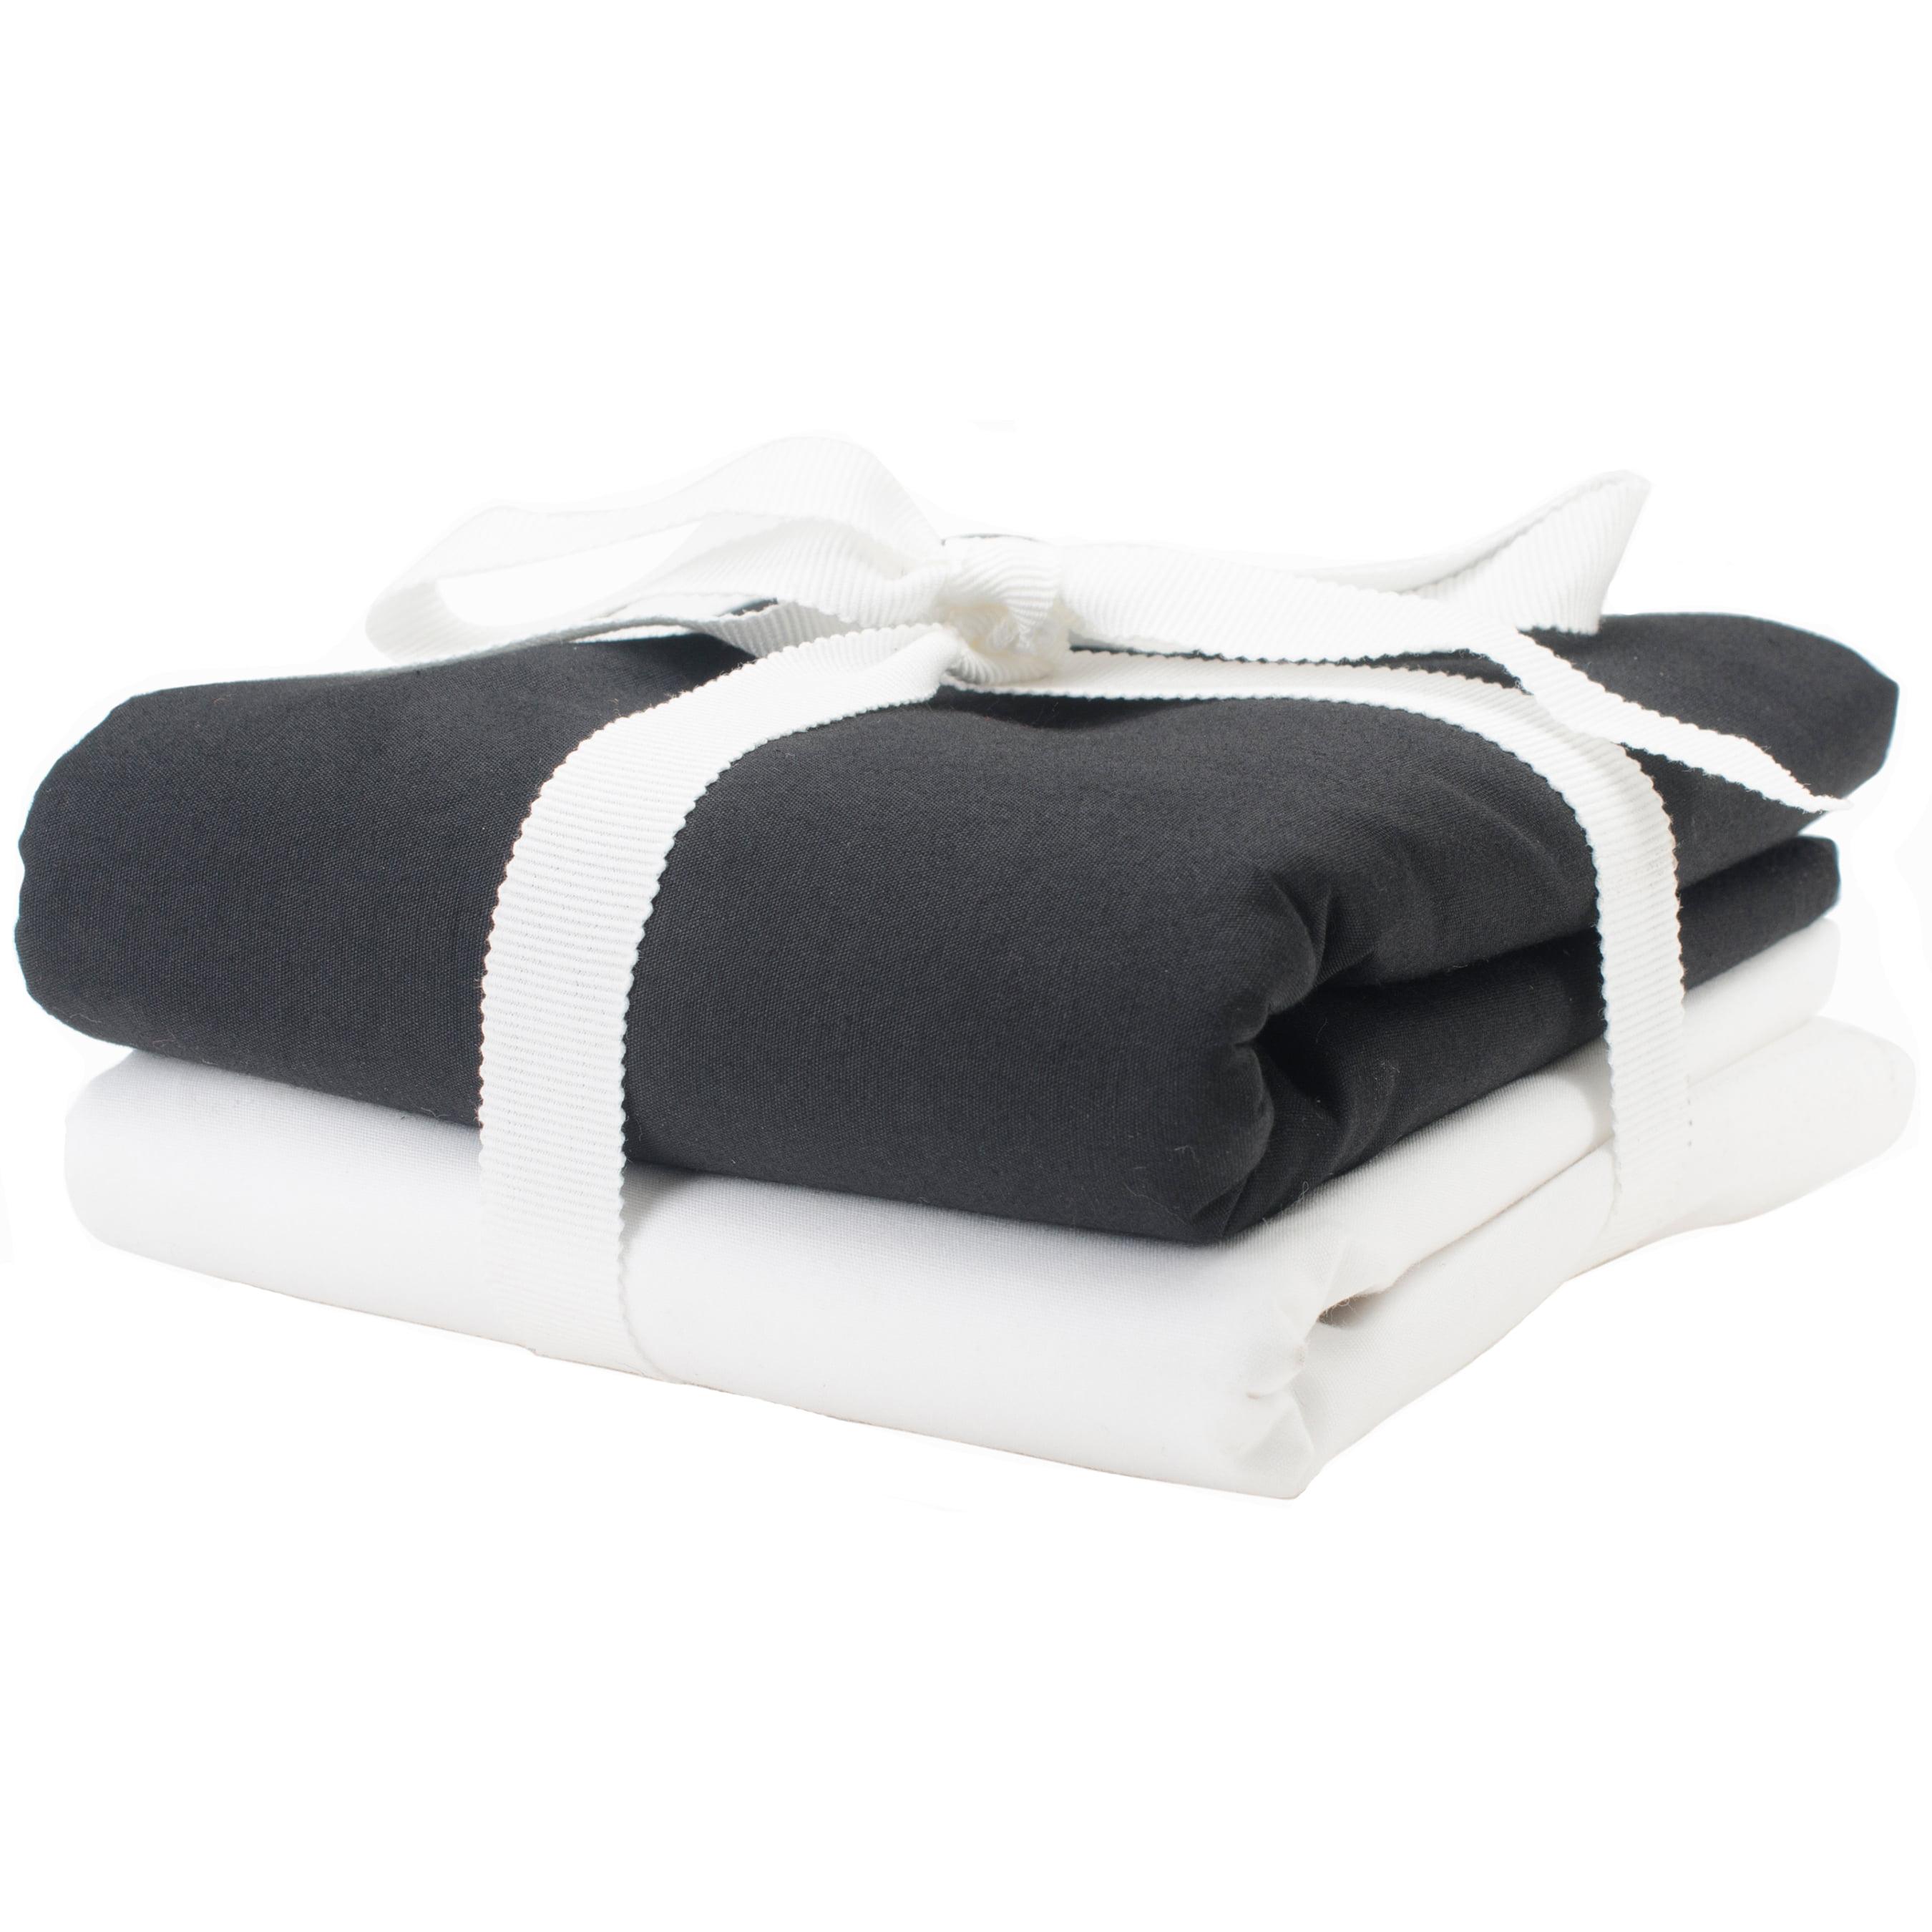 "Broadcloth Basic Blend Fabric 45"" Wide 3Yd Cut-Black - image 1 de 1"